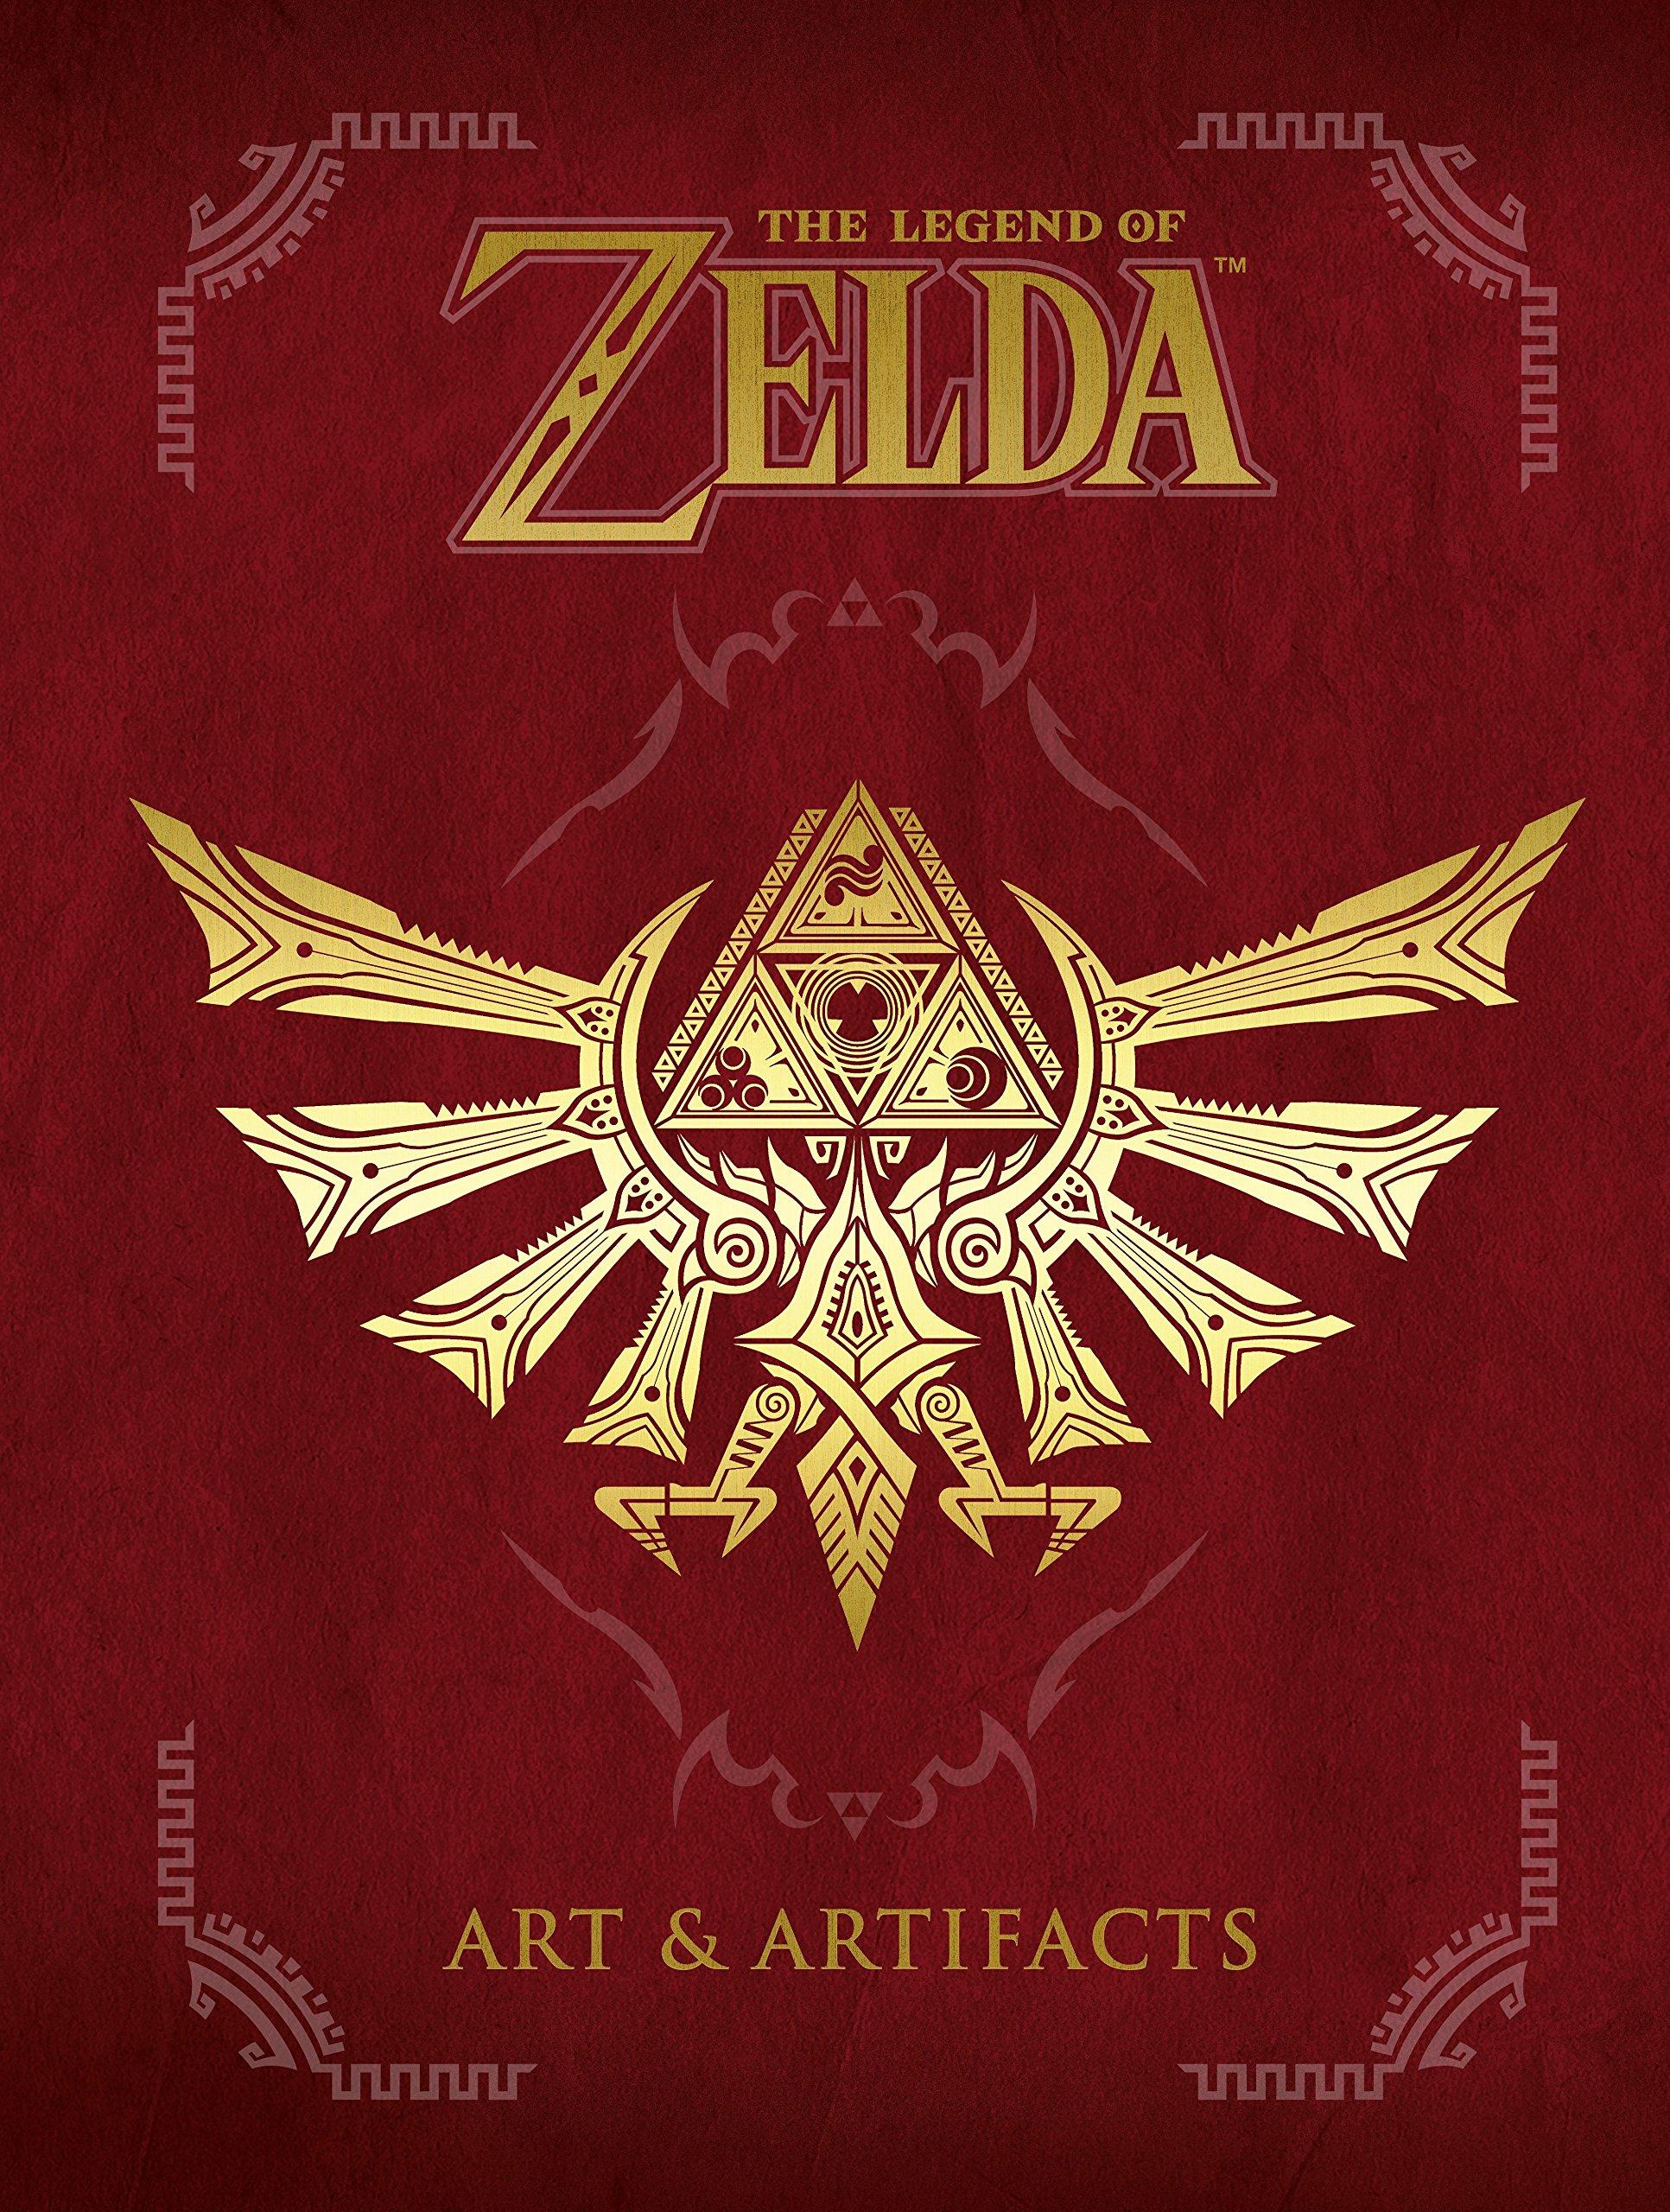 The Legend of Zelda: Art & Artifacts by Dark Horse Books